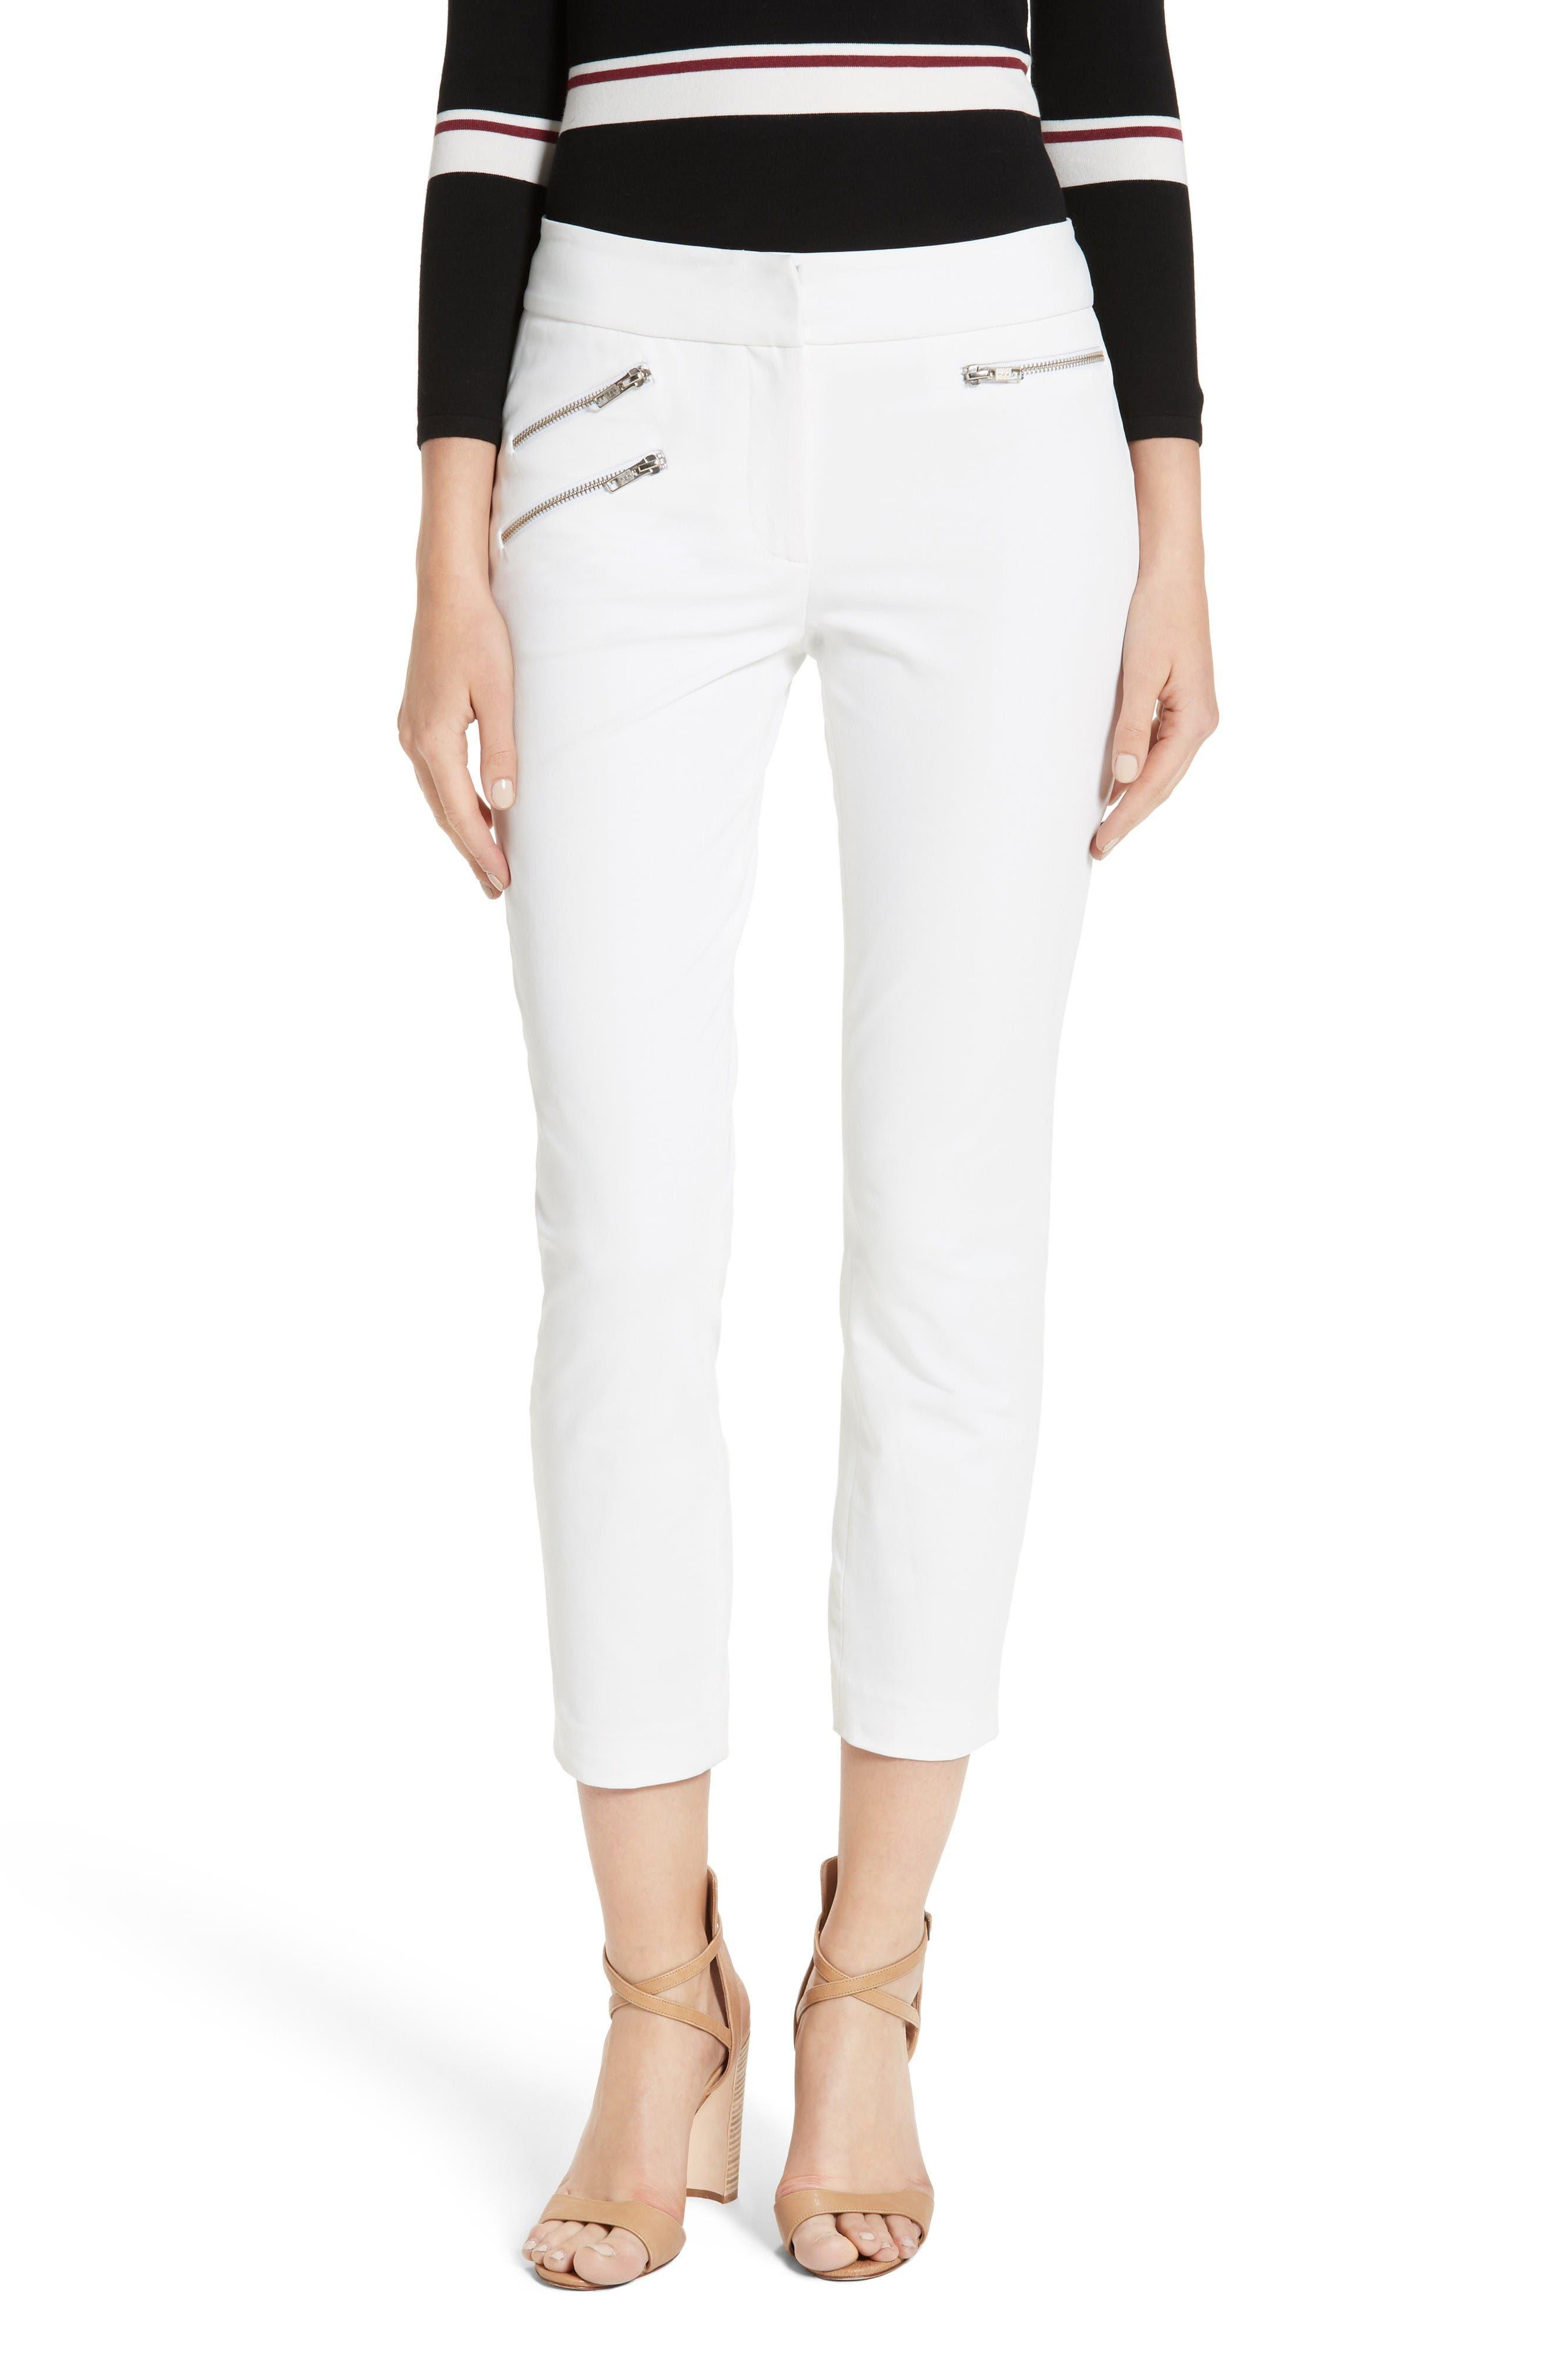 Roxy Crop Pants,                         Main,                         color, White